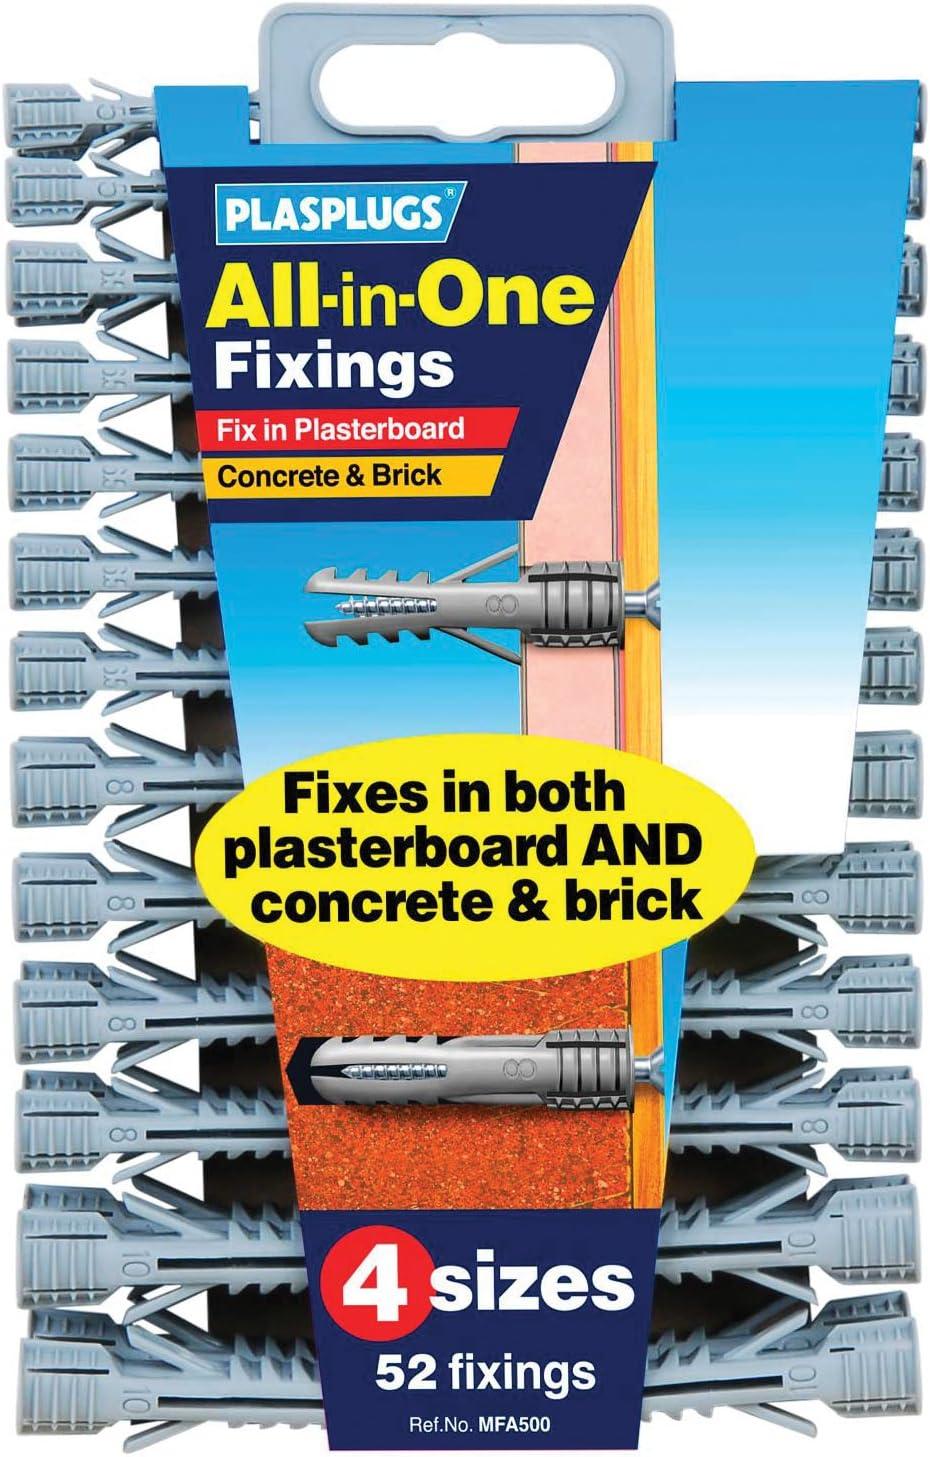 Plasplug All-in-One Plugs